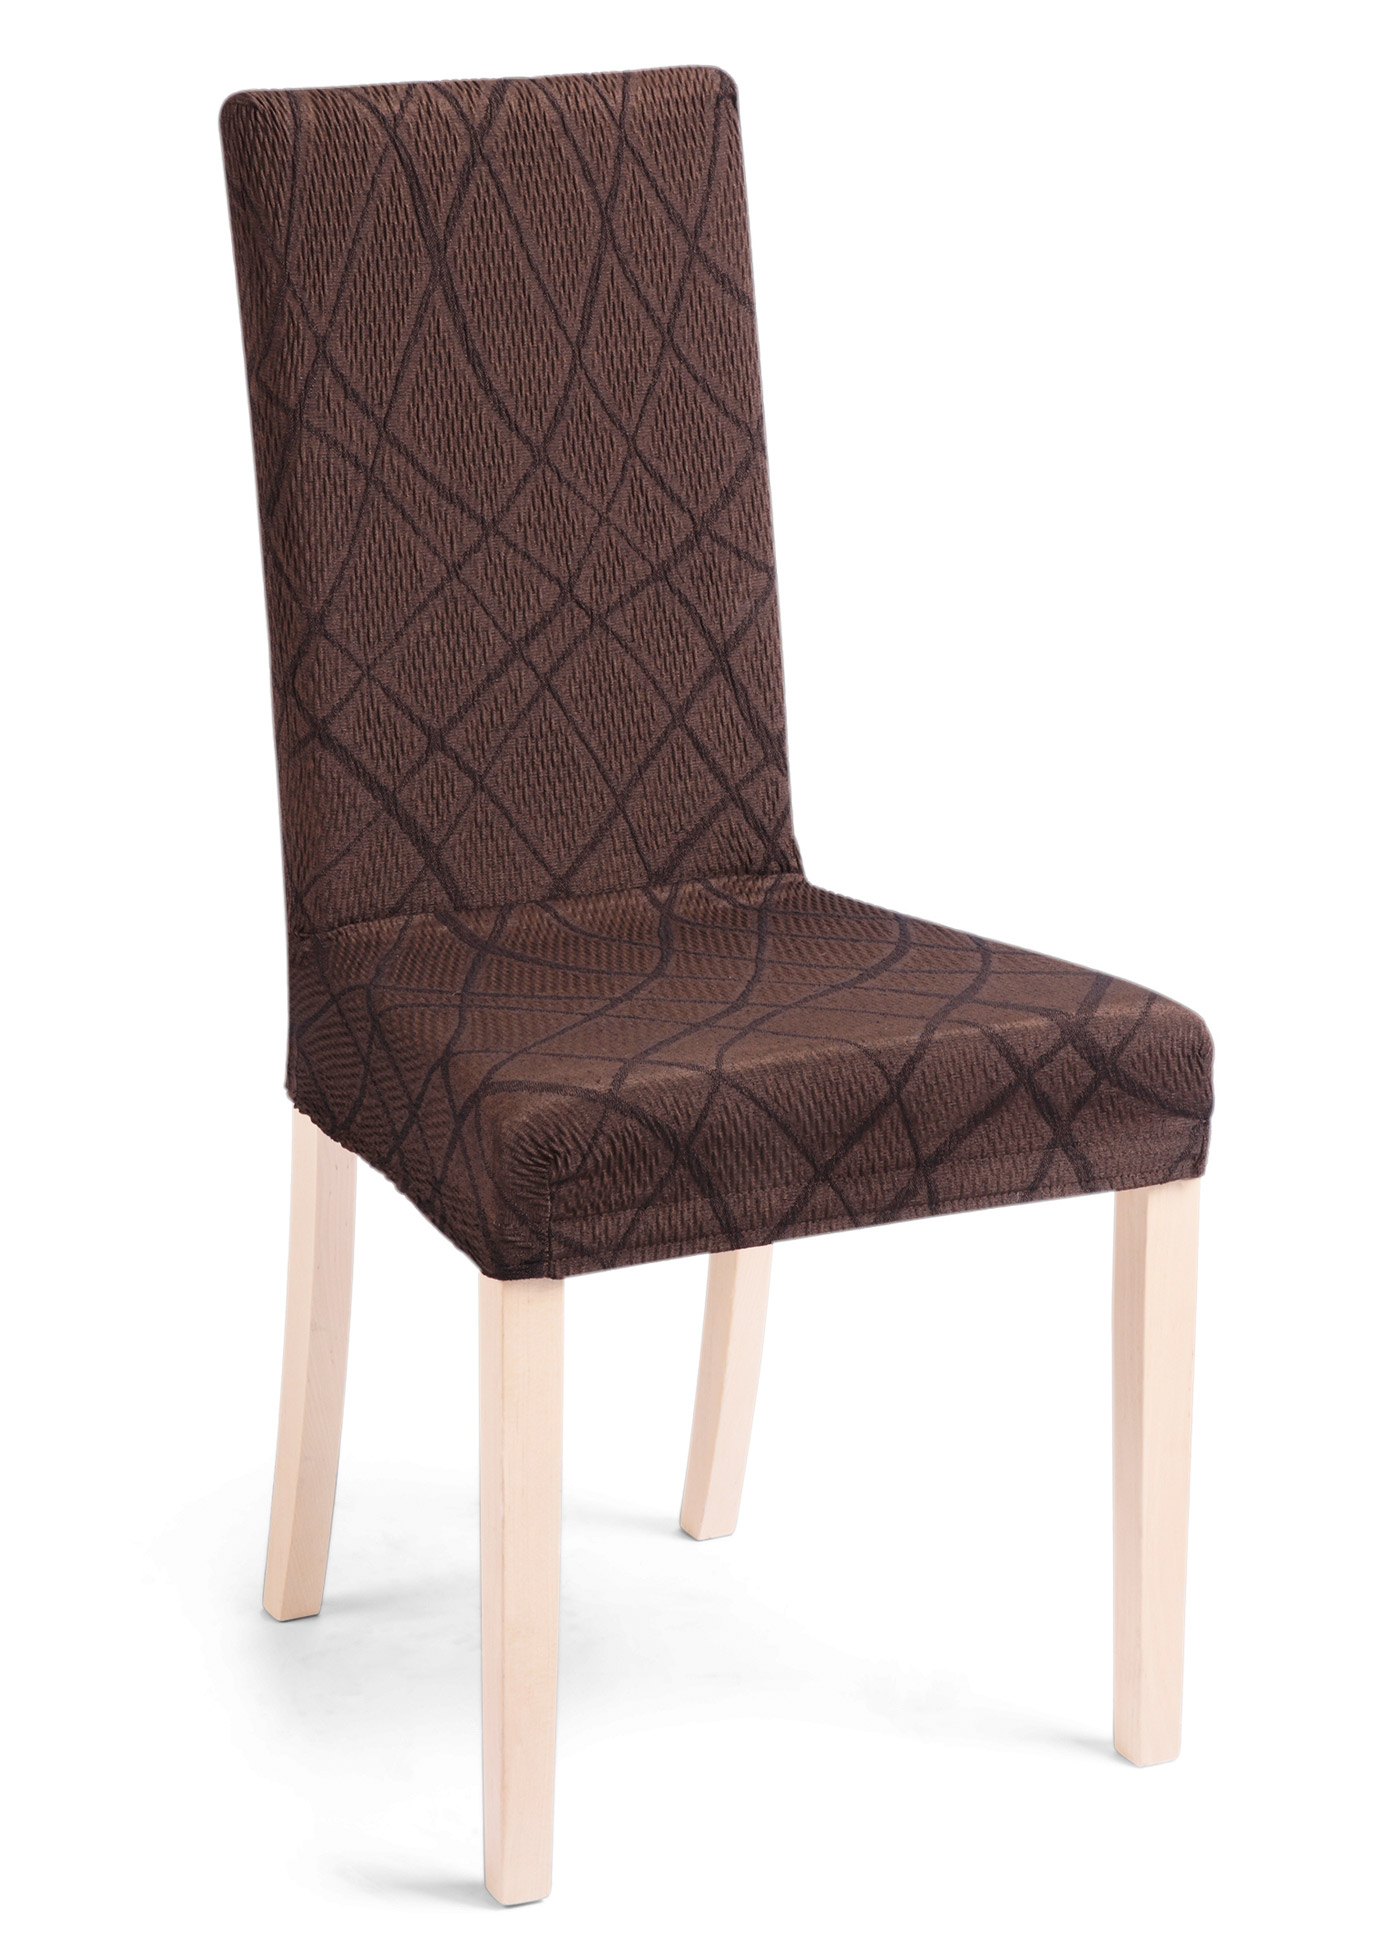 bonprix katalog gardinen adilo bon prix gardinen katalog fotos gardine kr uselband aufh ngen. Black Bedroom Furniture Sets. Home Design Ideas